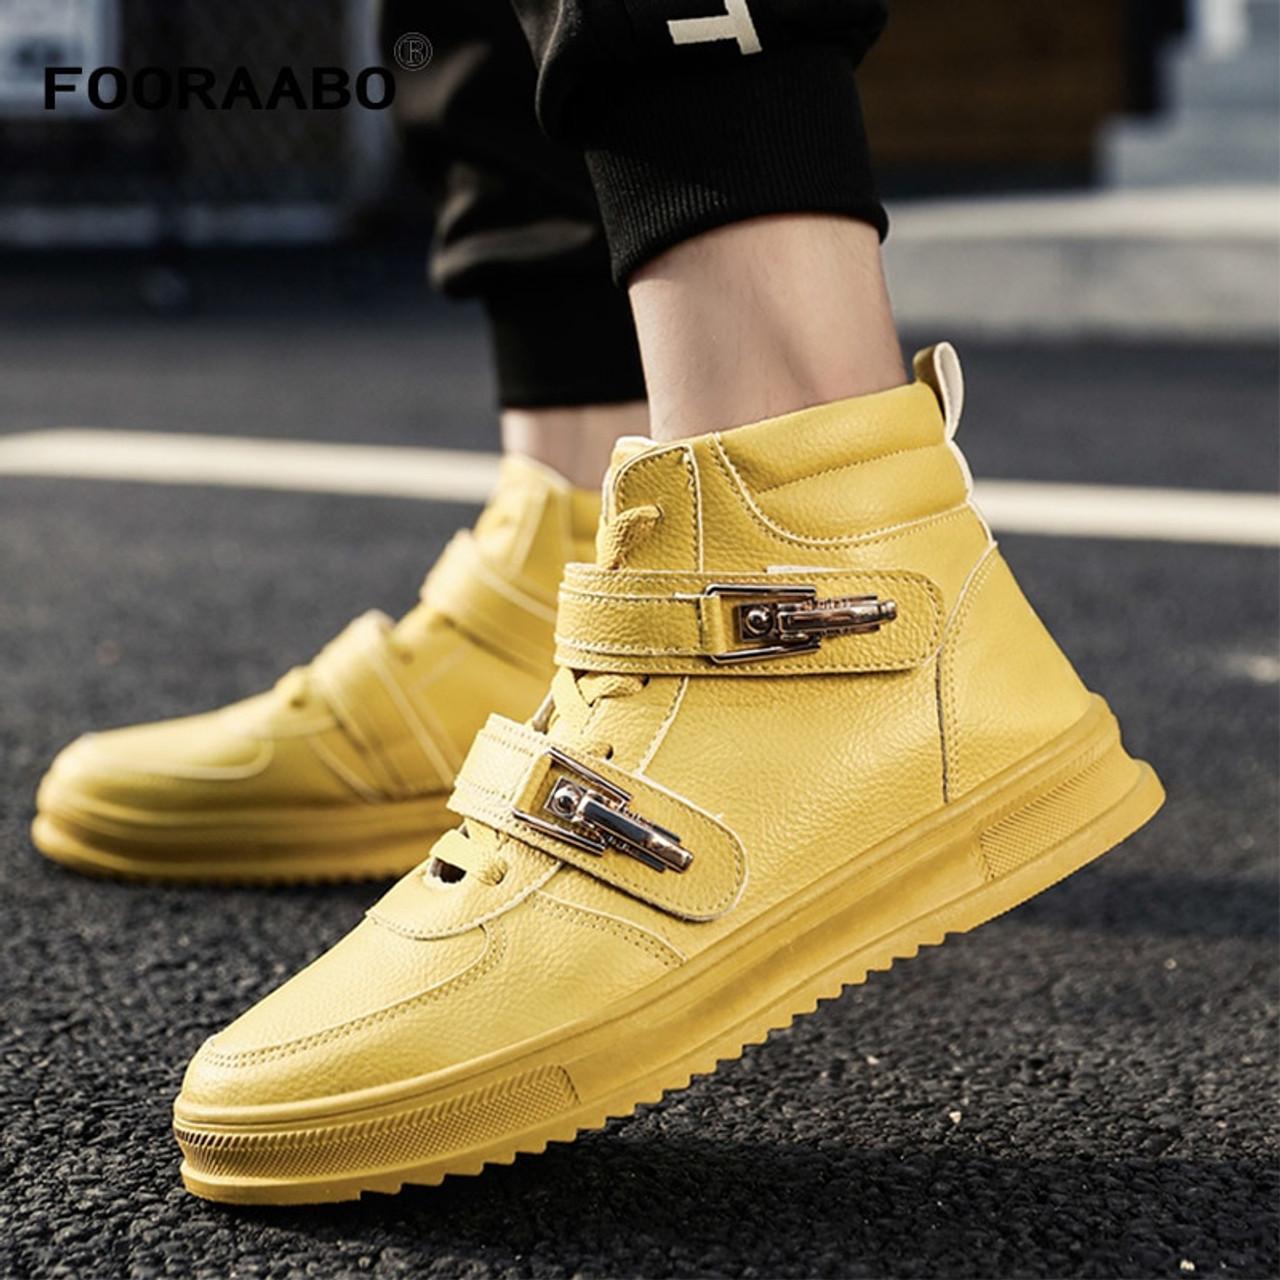 895280e7e 2018 New Luxury High Top Mens Casual Shoes Flats Autumn Hip Hop Male  Footwear High Top ...